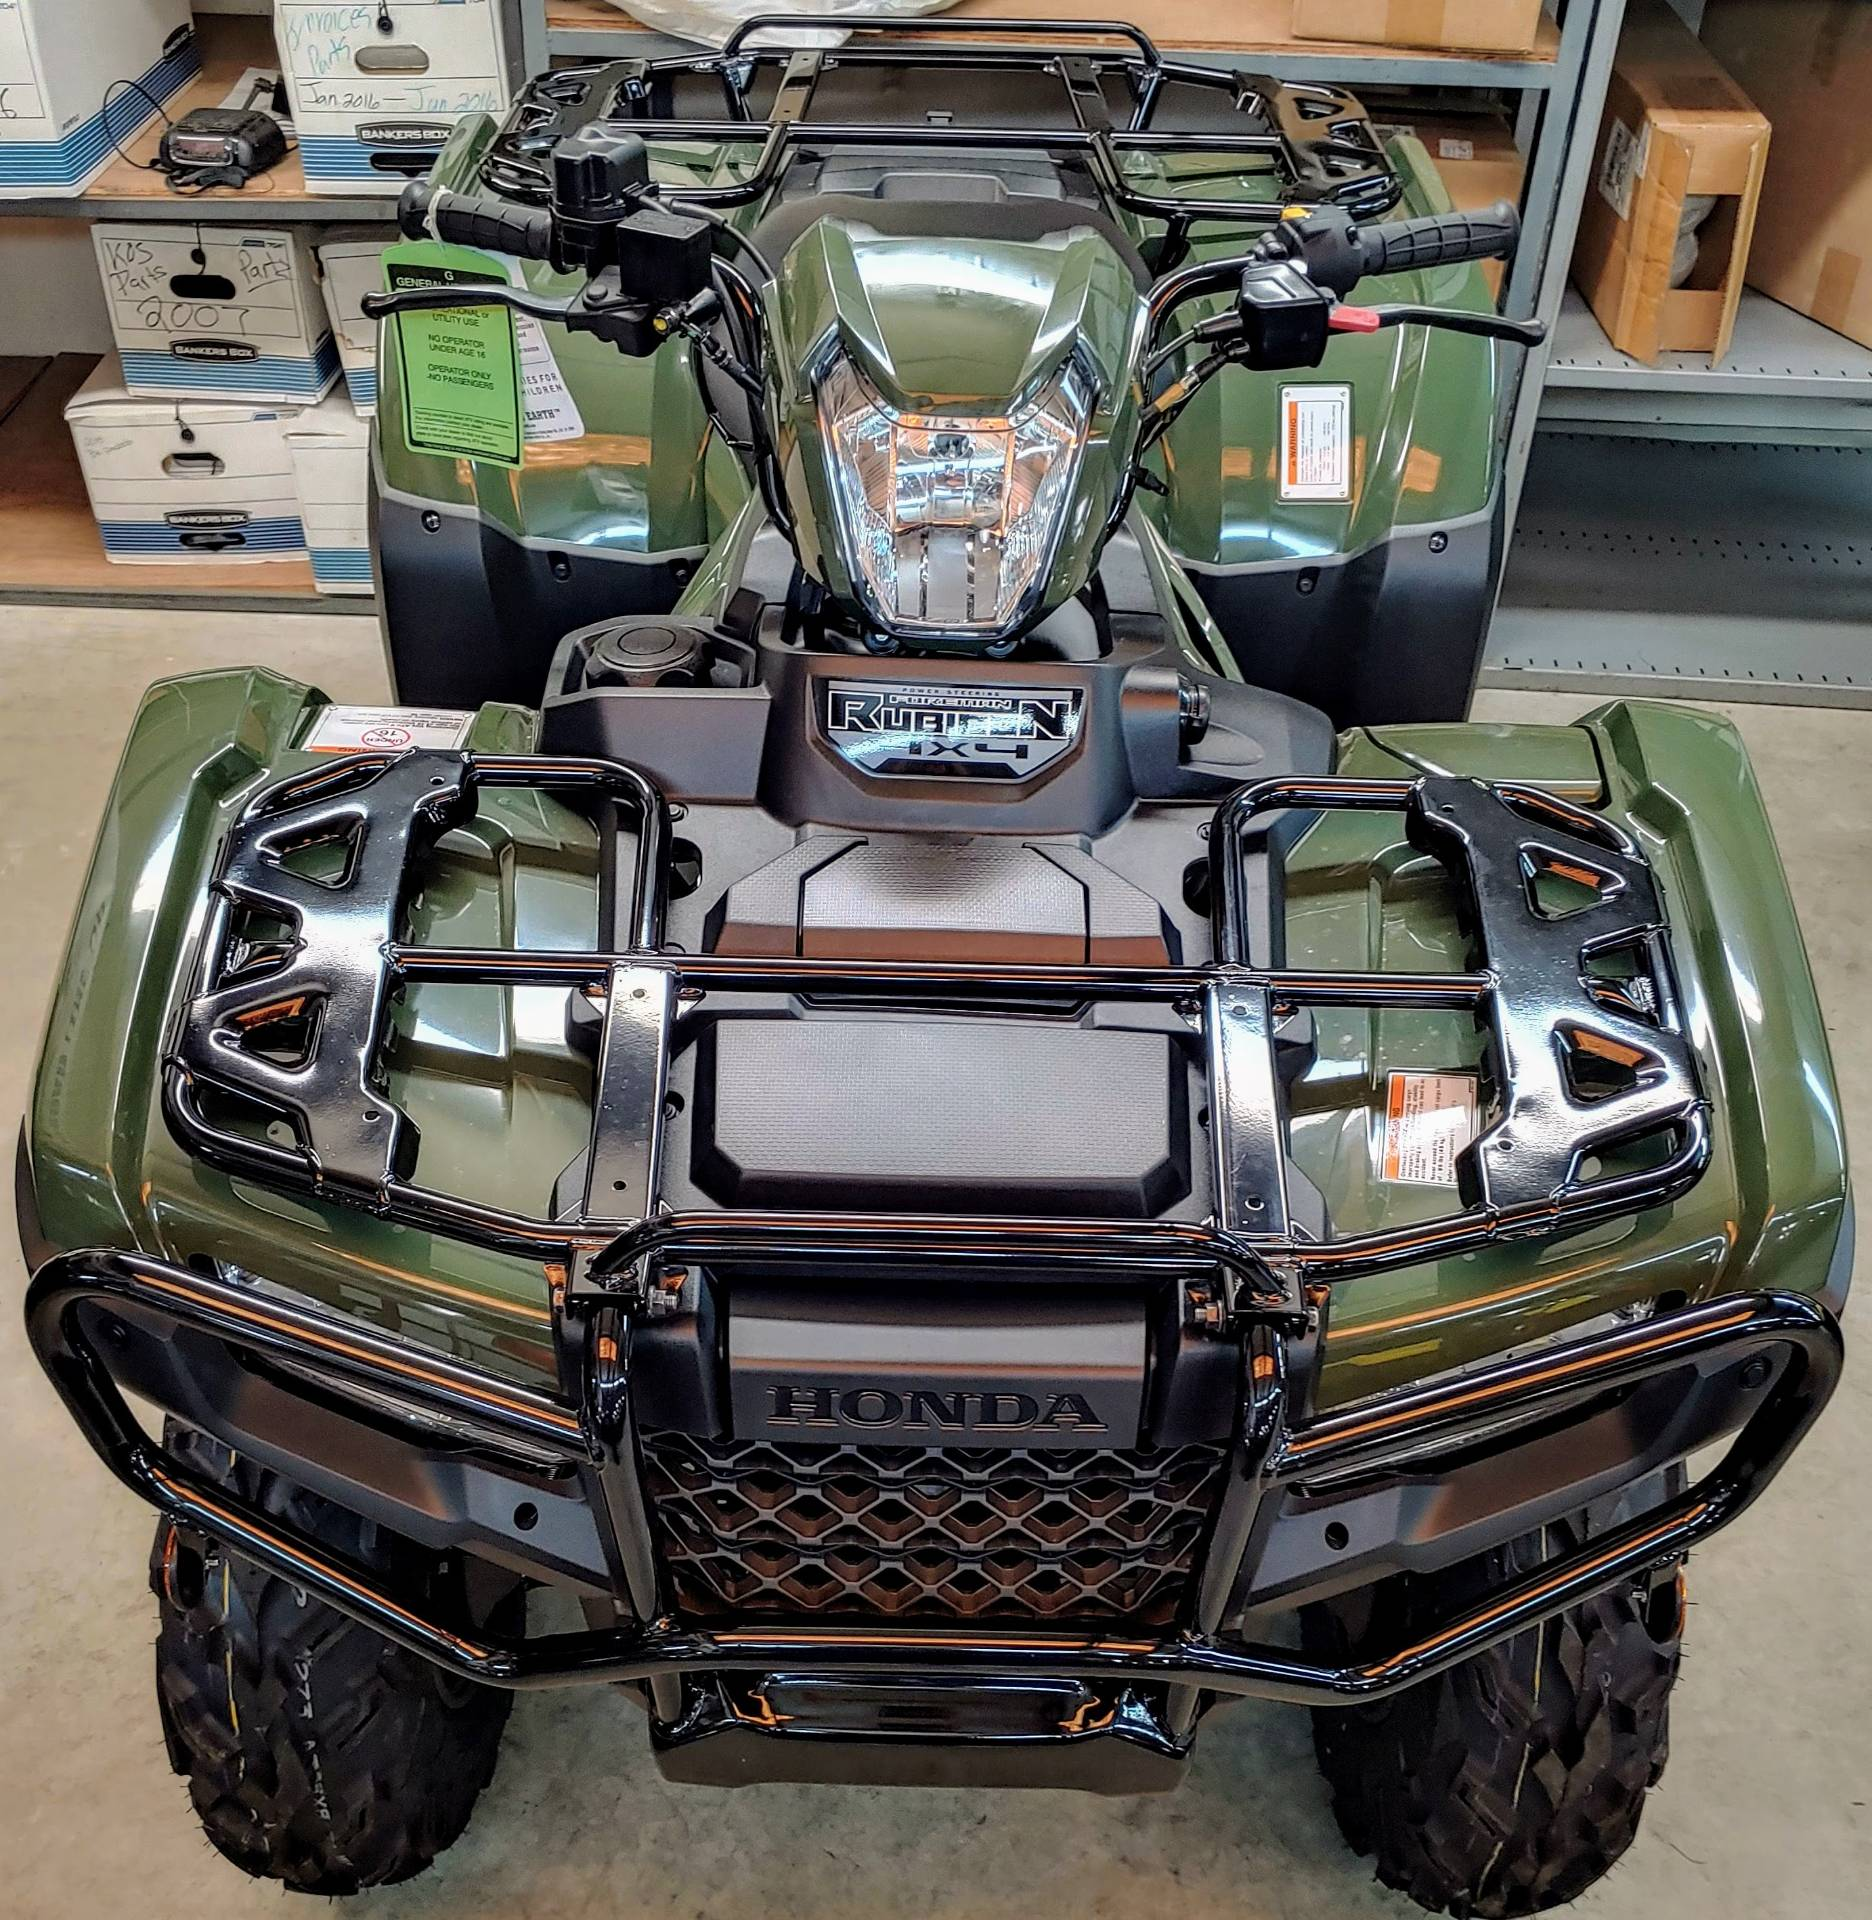 2019 Honda FourTrax Foreman Rubicon 4x4 EPS in Statesville, North Carolina